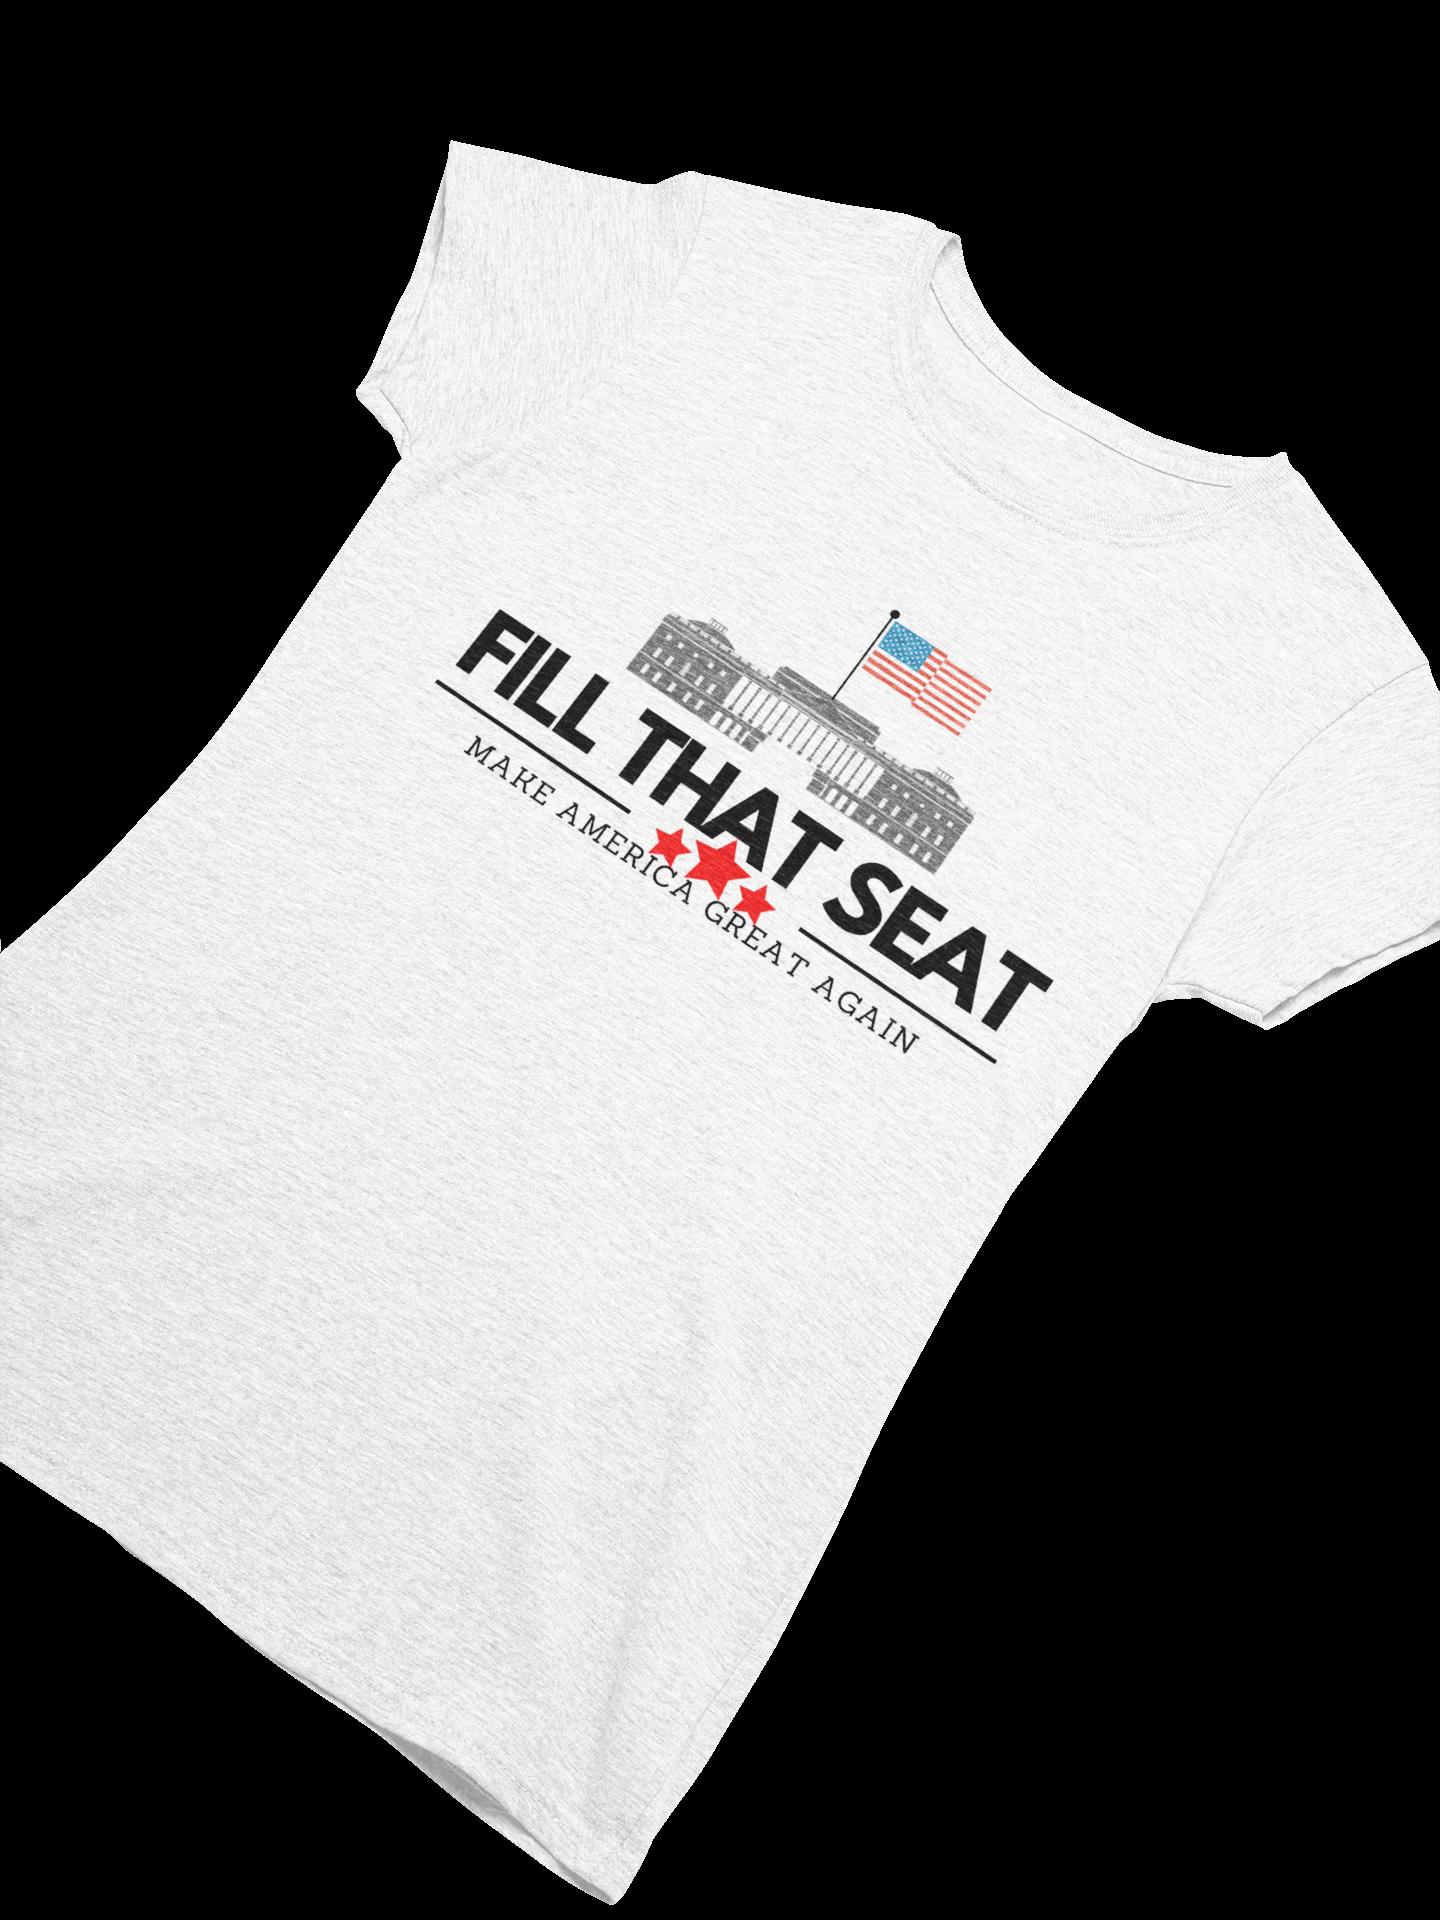 Fill That Seat Make America Great Again Design Shirt Fitted Scoop T Shirt By Farhatkhanfir Shirt Designs Shirts Casual Tee